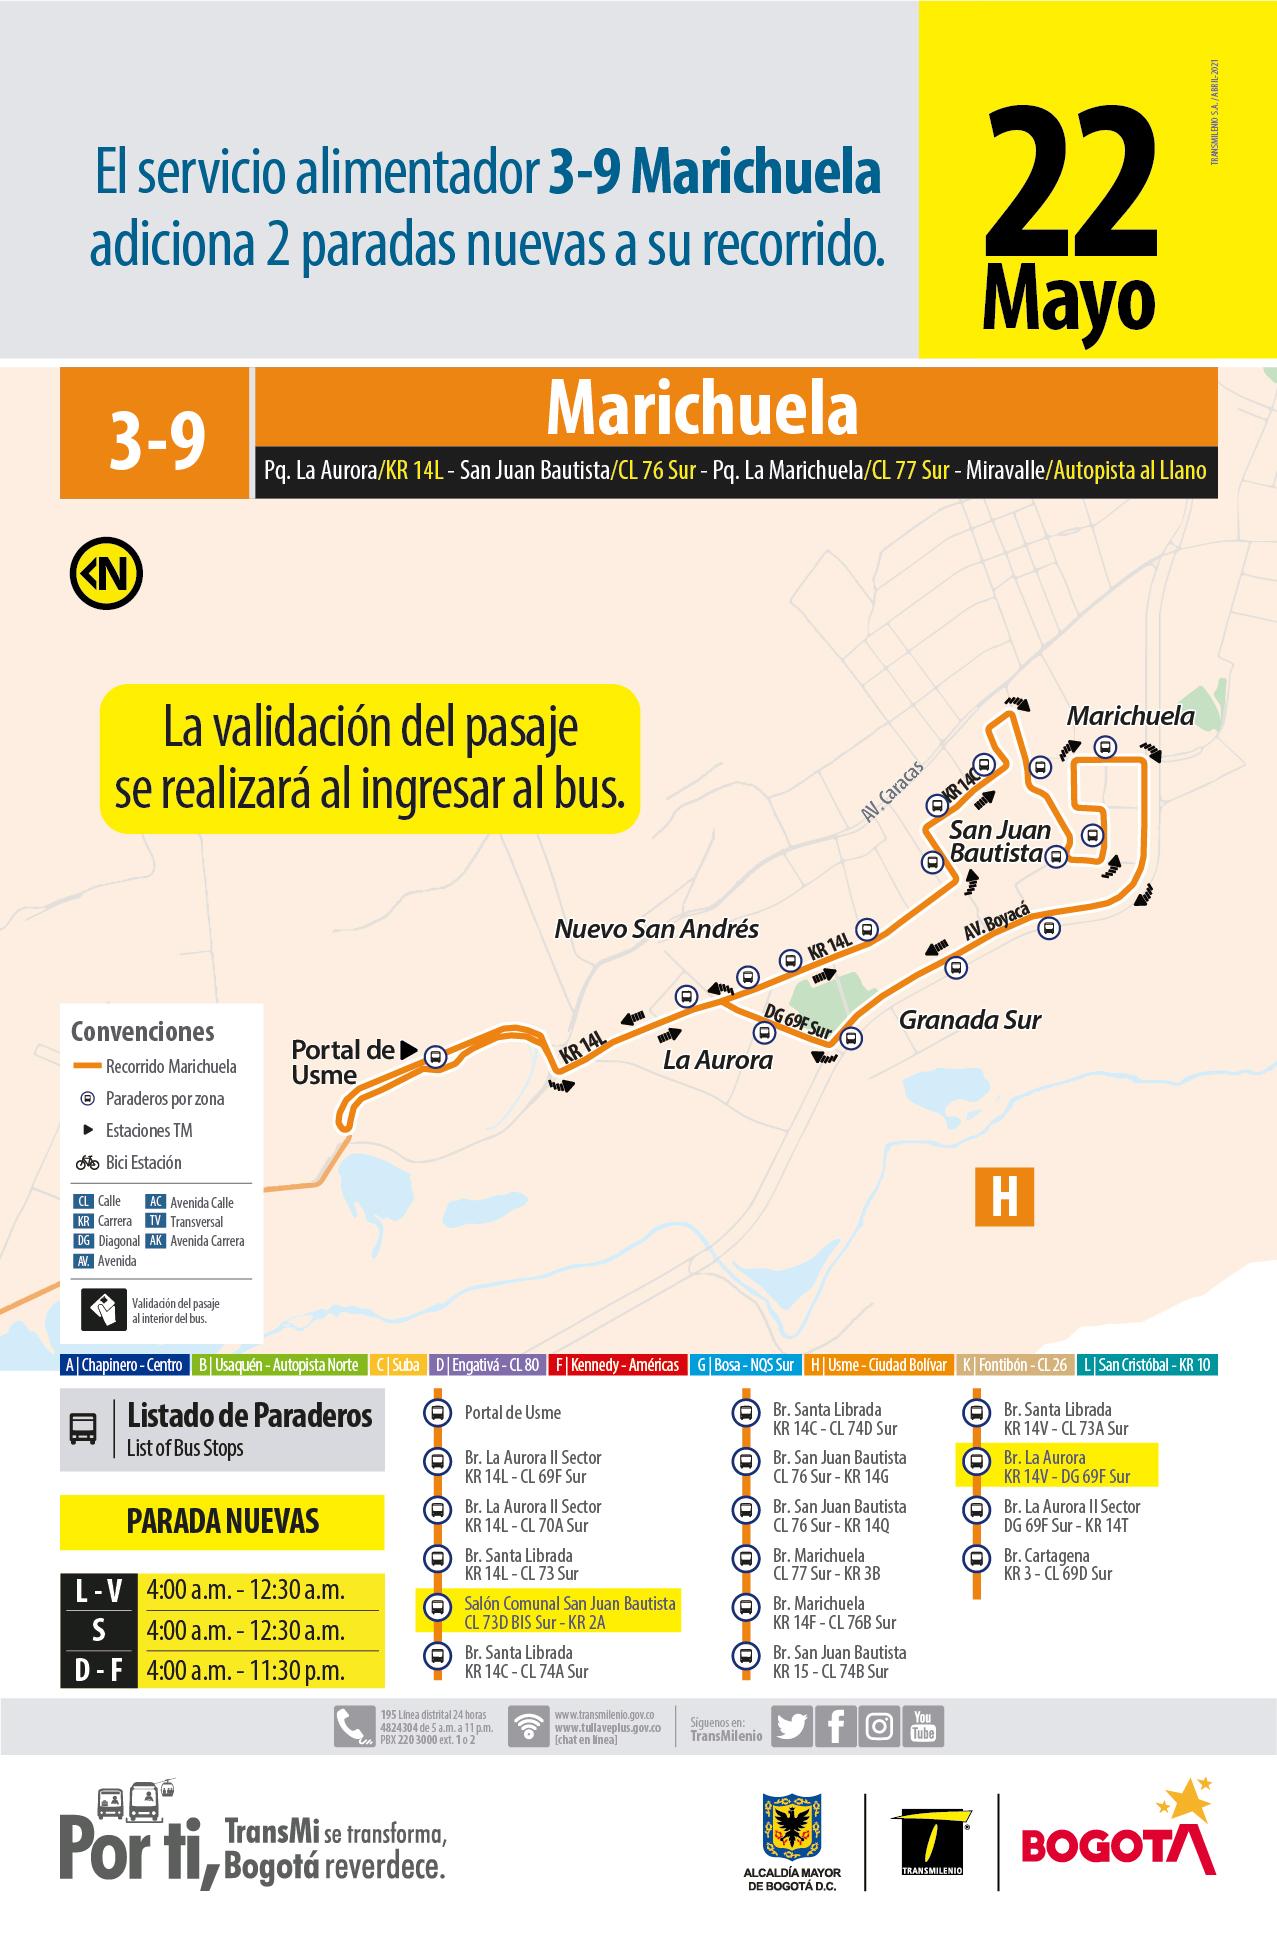 3-9 Marichuela